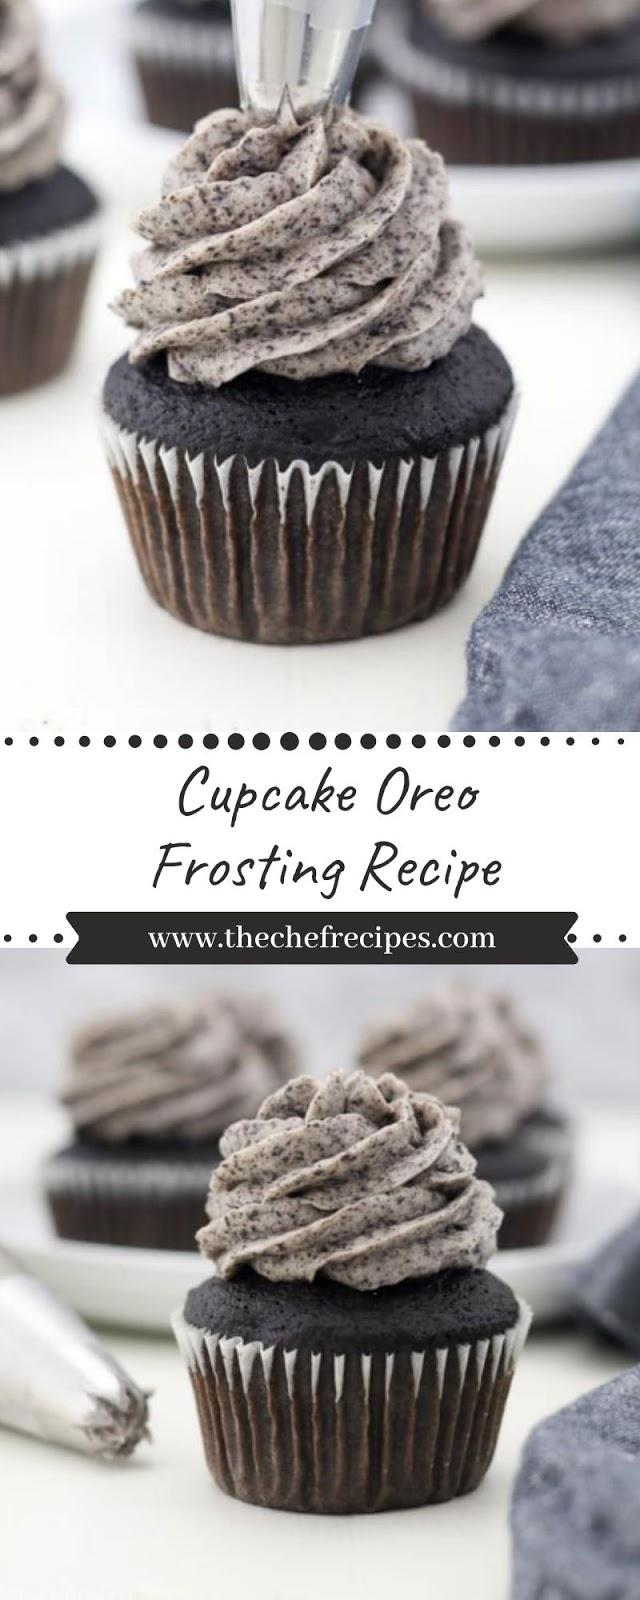 Cupcake Oreo Frosting Recipe